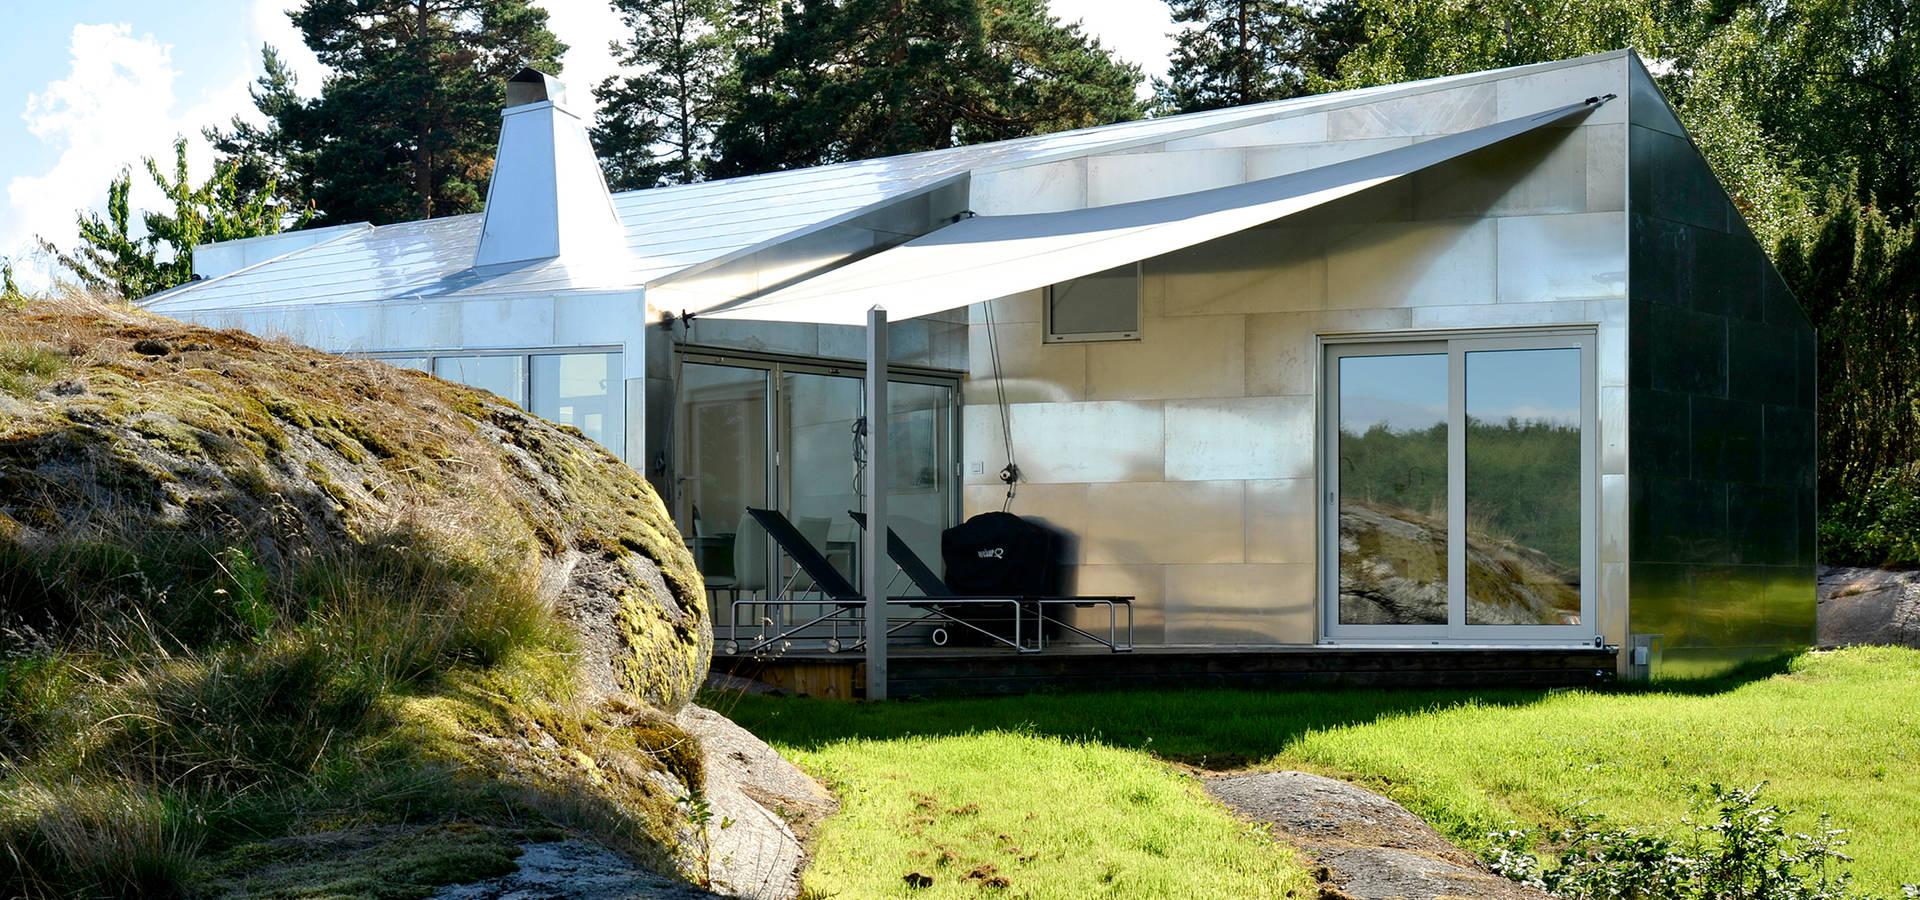 Rock house di jarmund vigsn s as arkitekter mnal homify for Case in stile ranch in stile log cabin